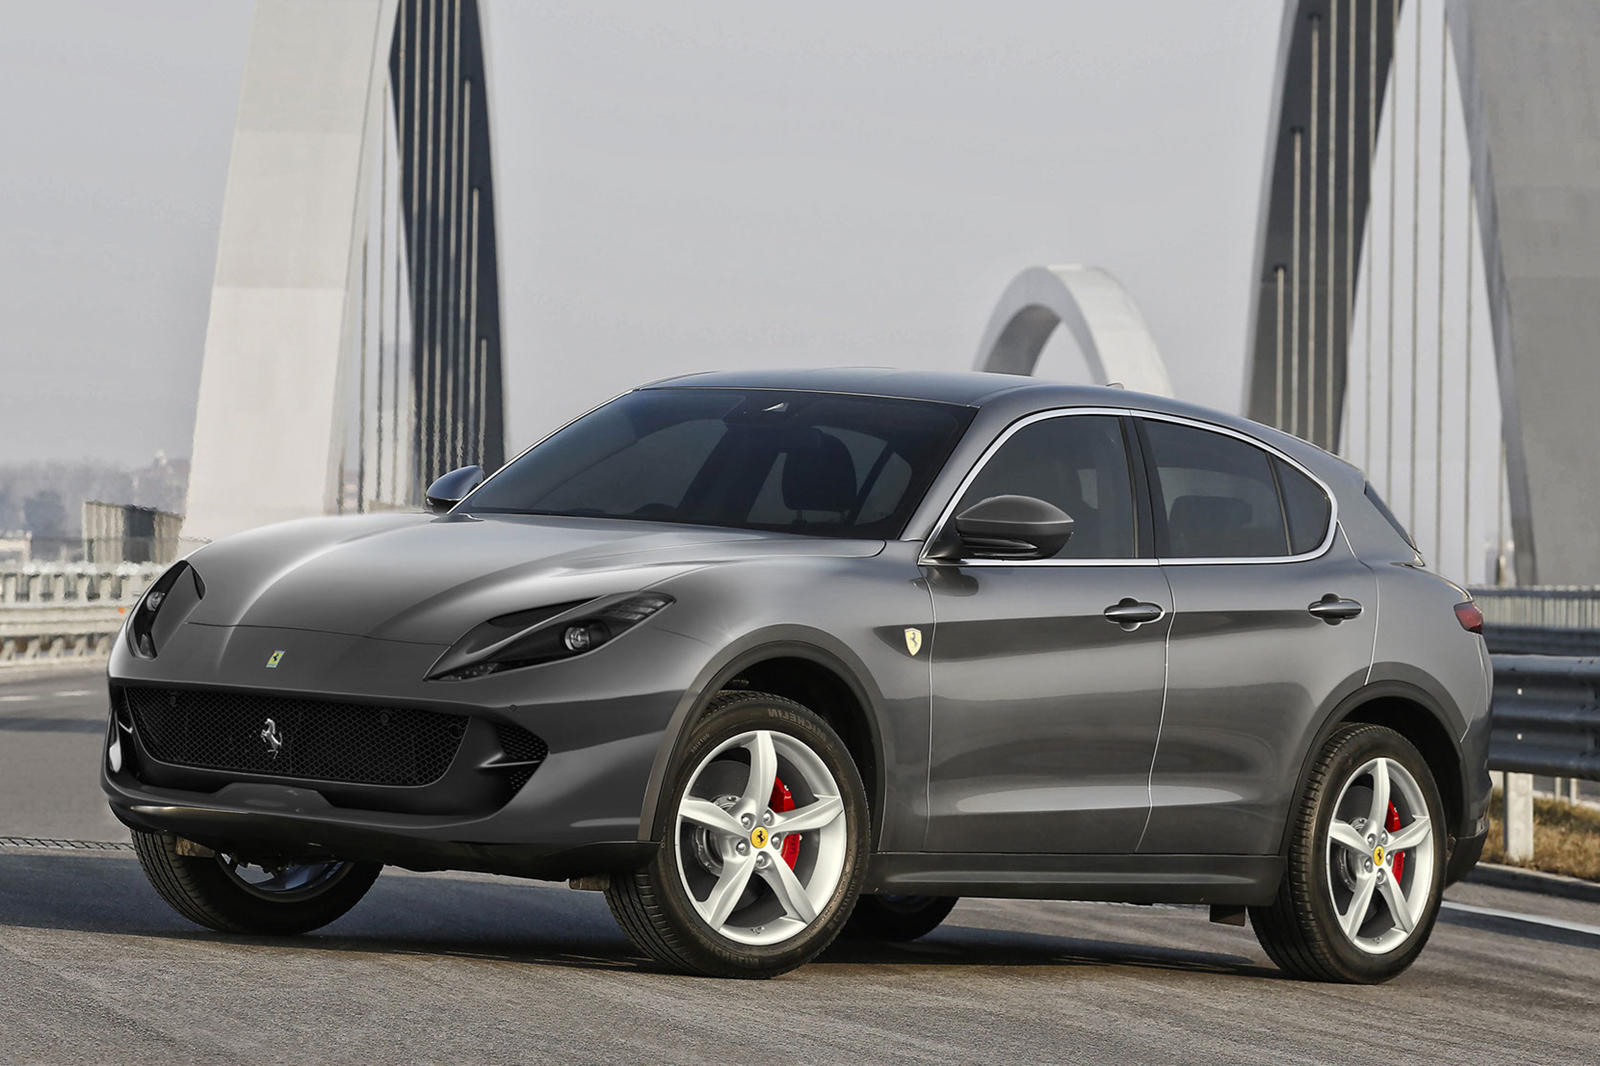 2022 Ferrari Purosangue Review Trims Specs Price New Interior Features Exterior Design And Specifications Carbuzz